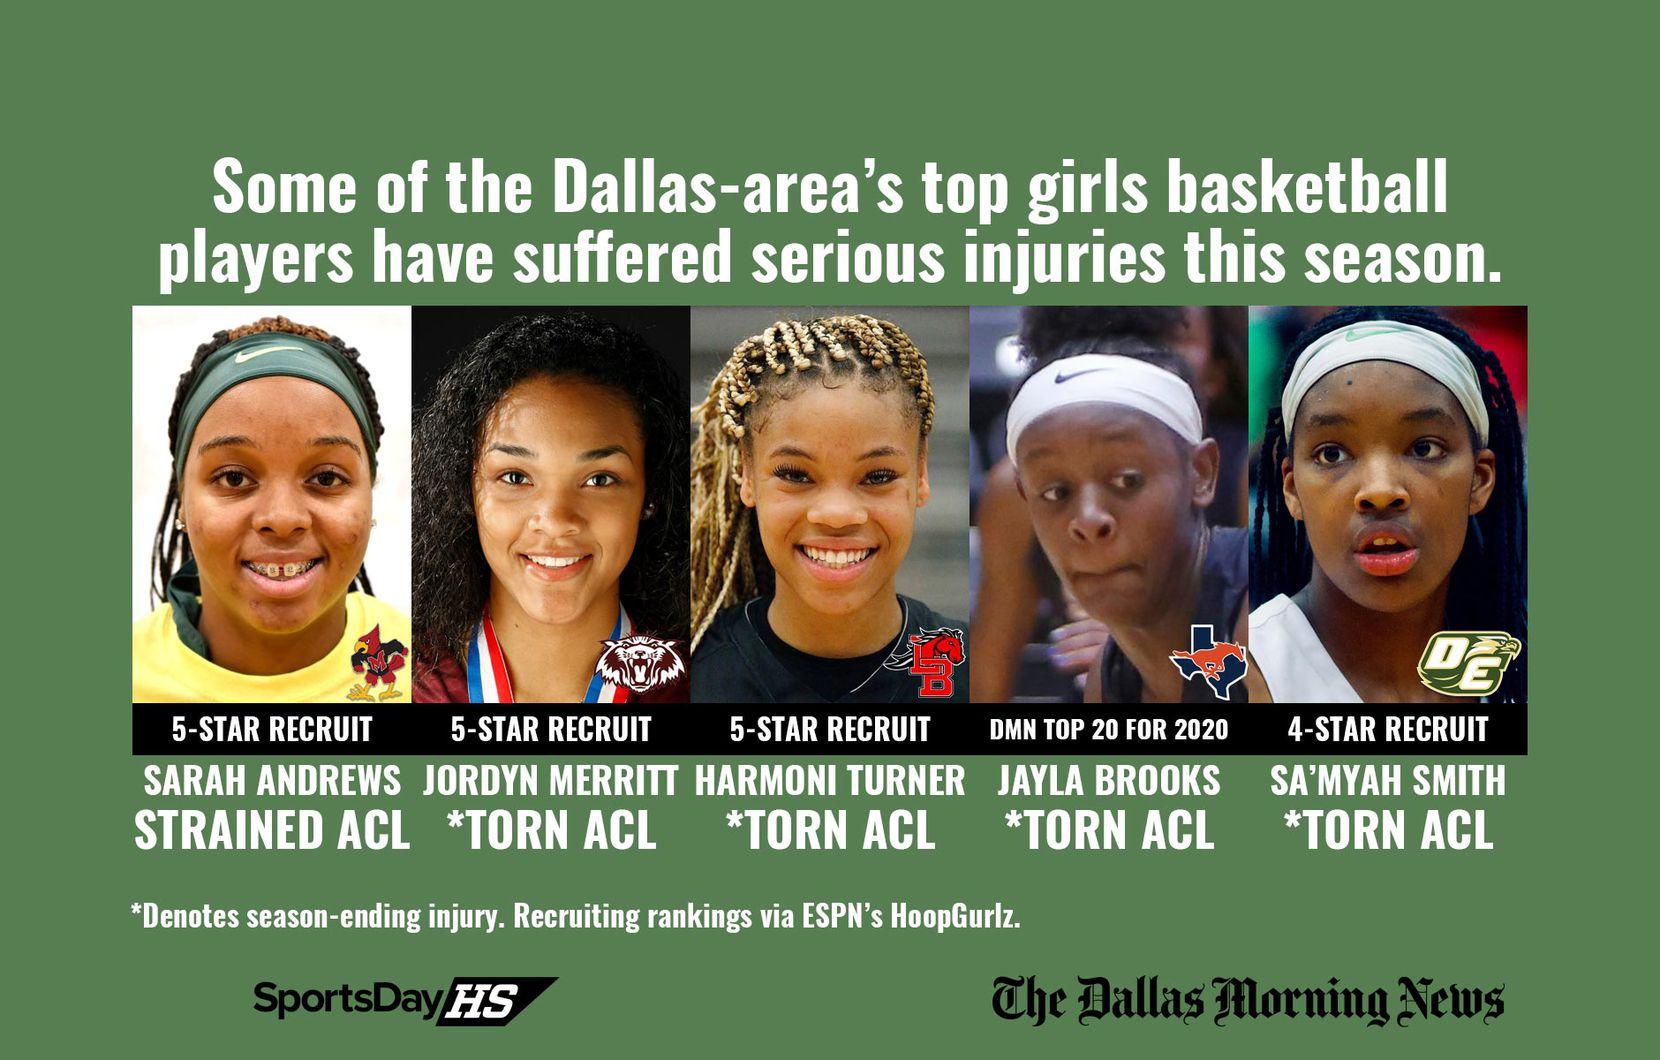 Graphic by Joshua Friemel/The Dallas Morning News